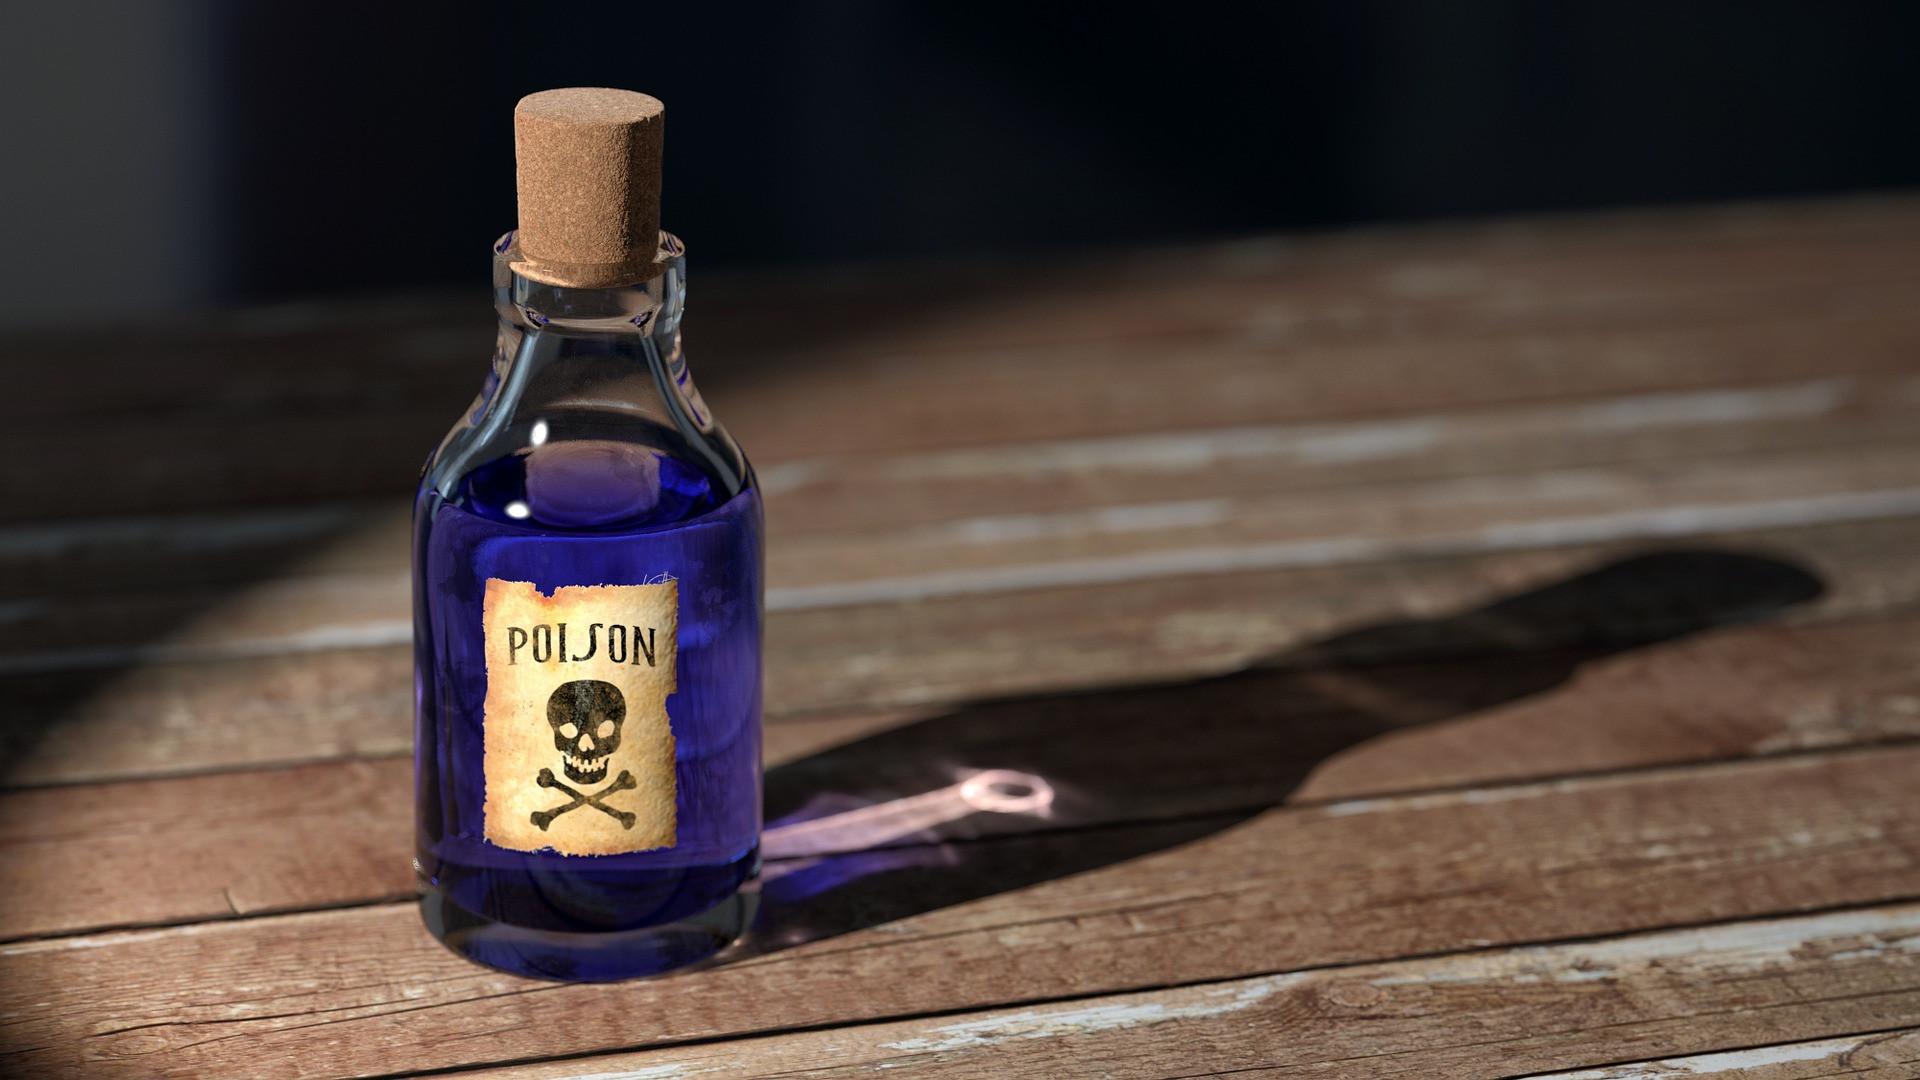 Toxic People - Avoid Their Poison